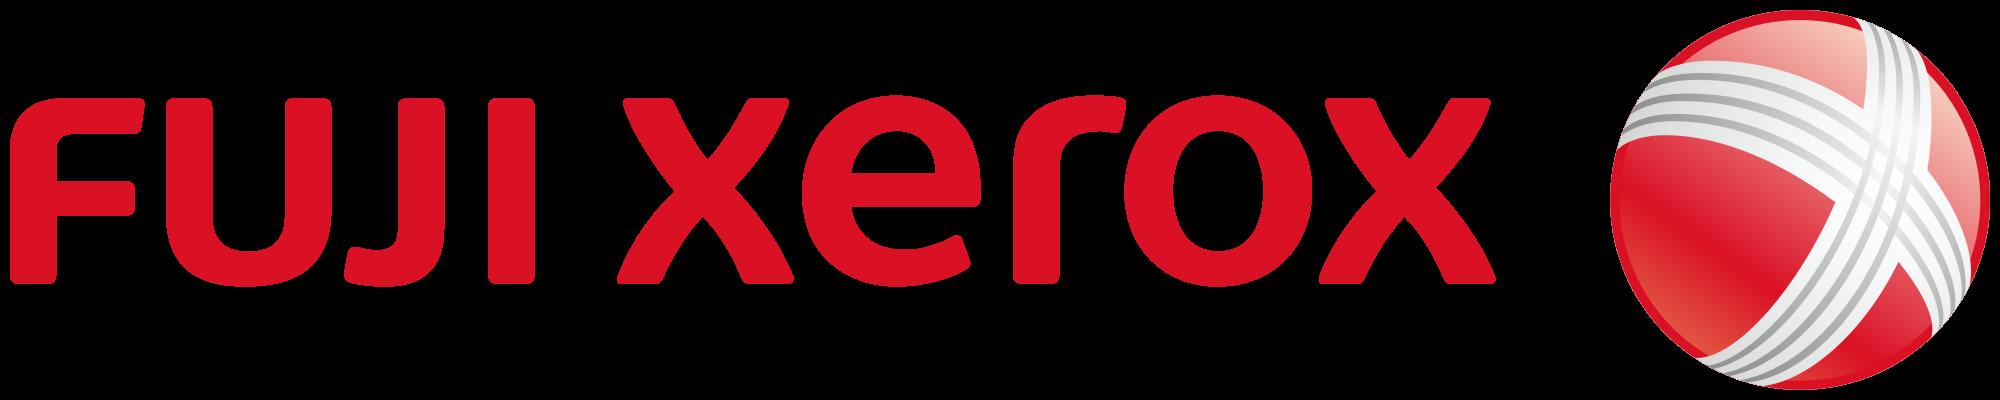 Fujifilm risque de ne plus fusionner avec Xerox